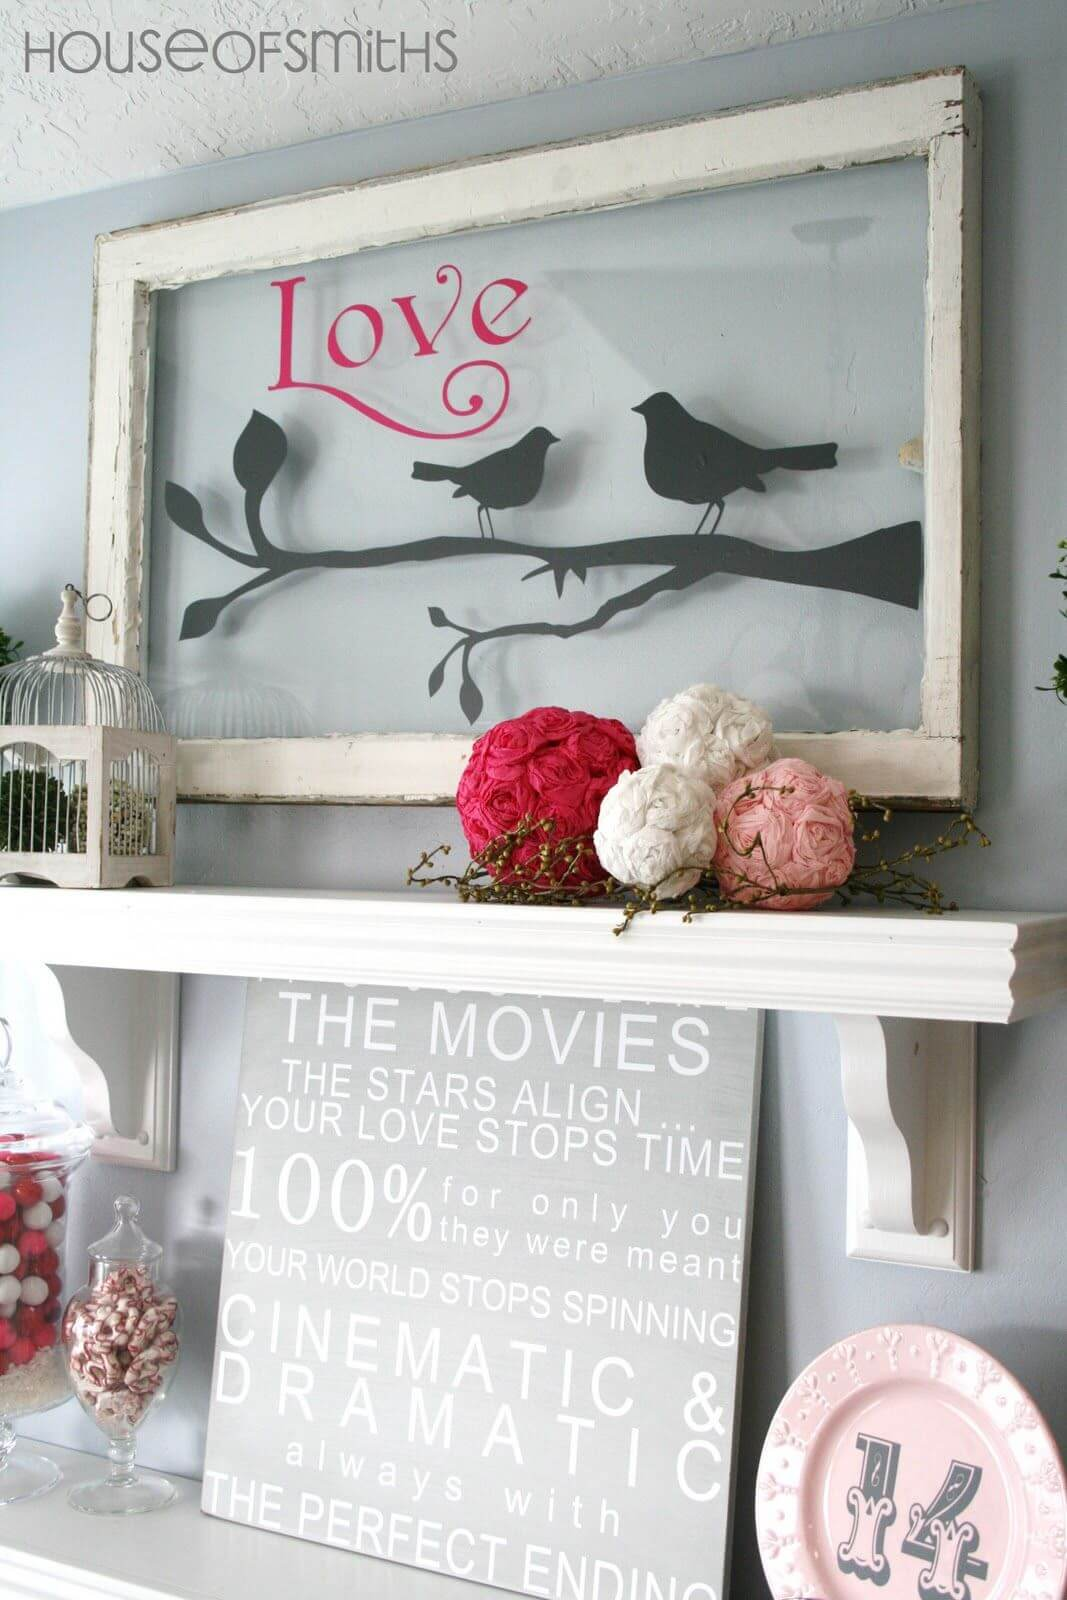 Traditional White Mantel Shelf Framed Art and Flowers